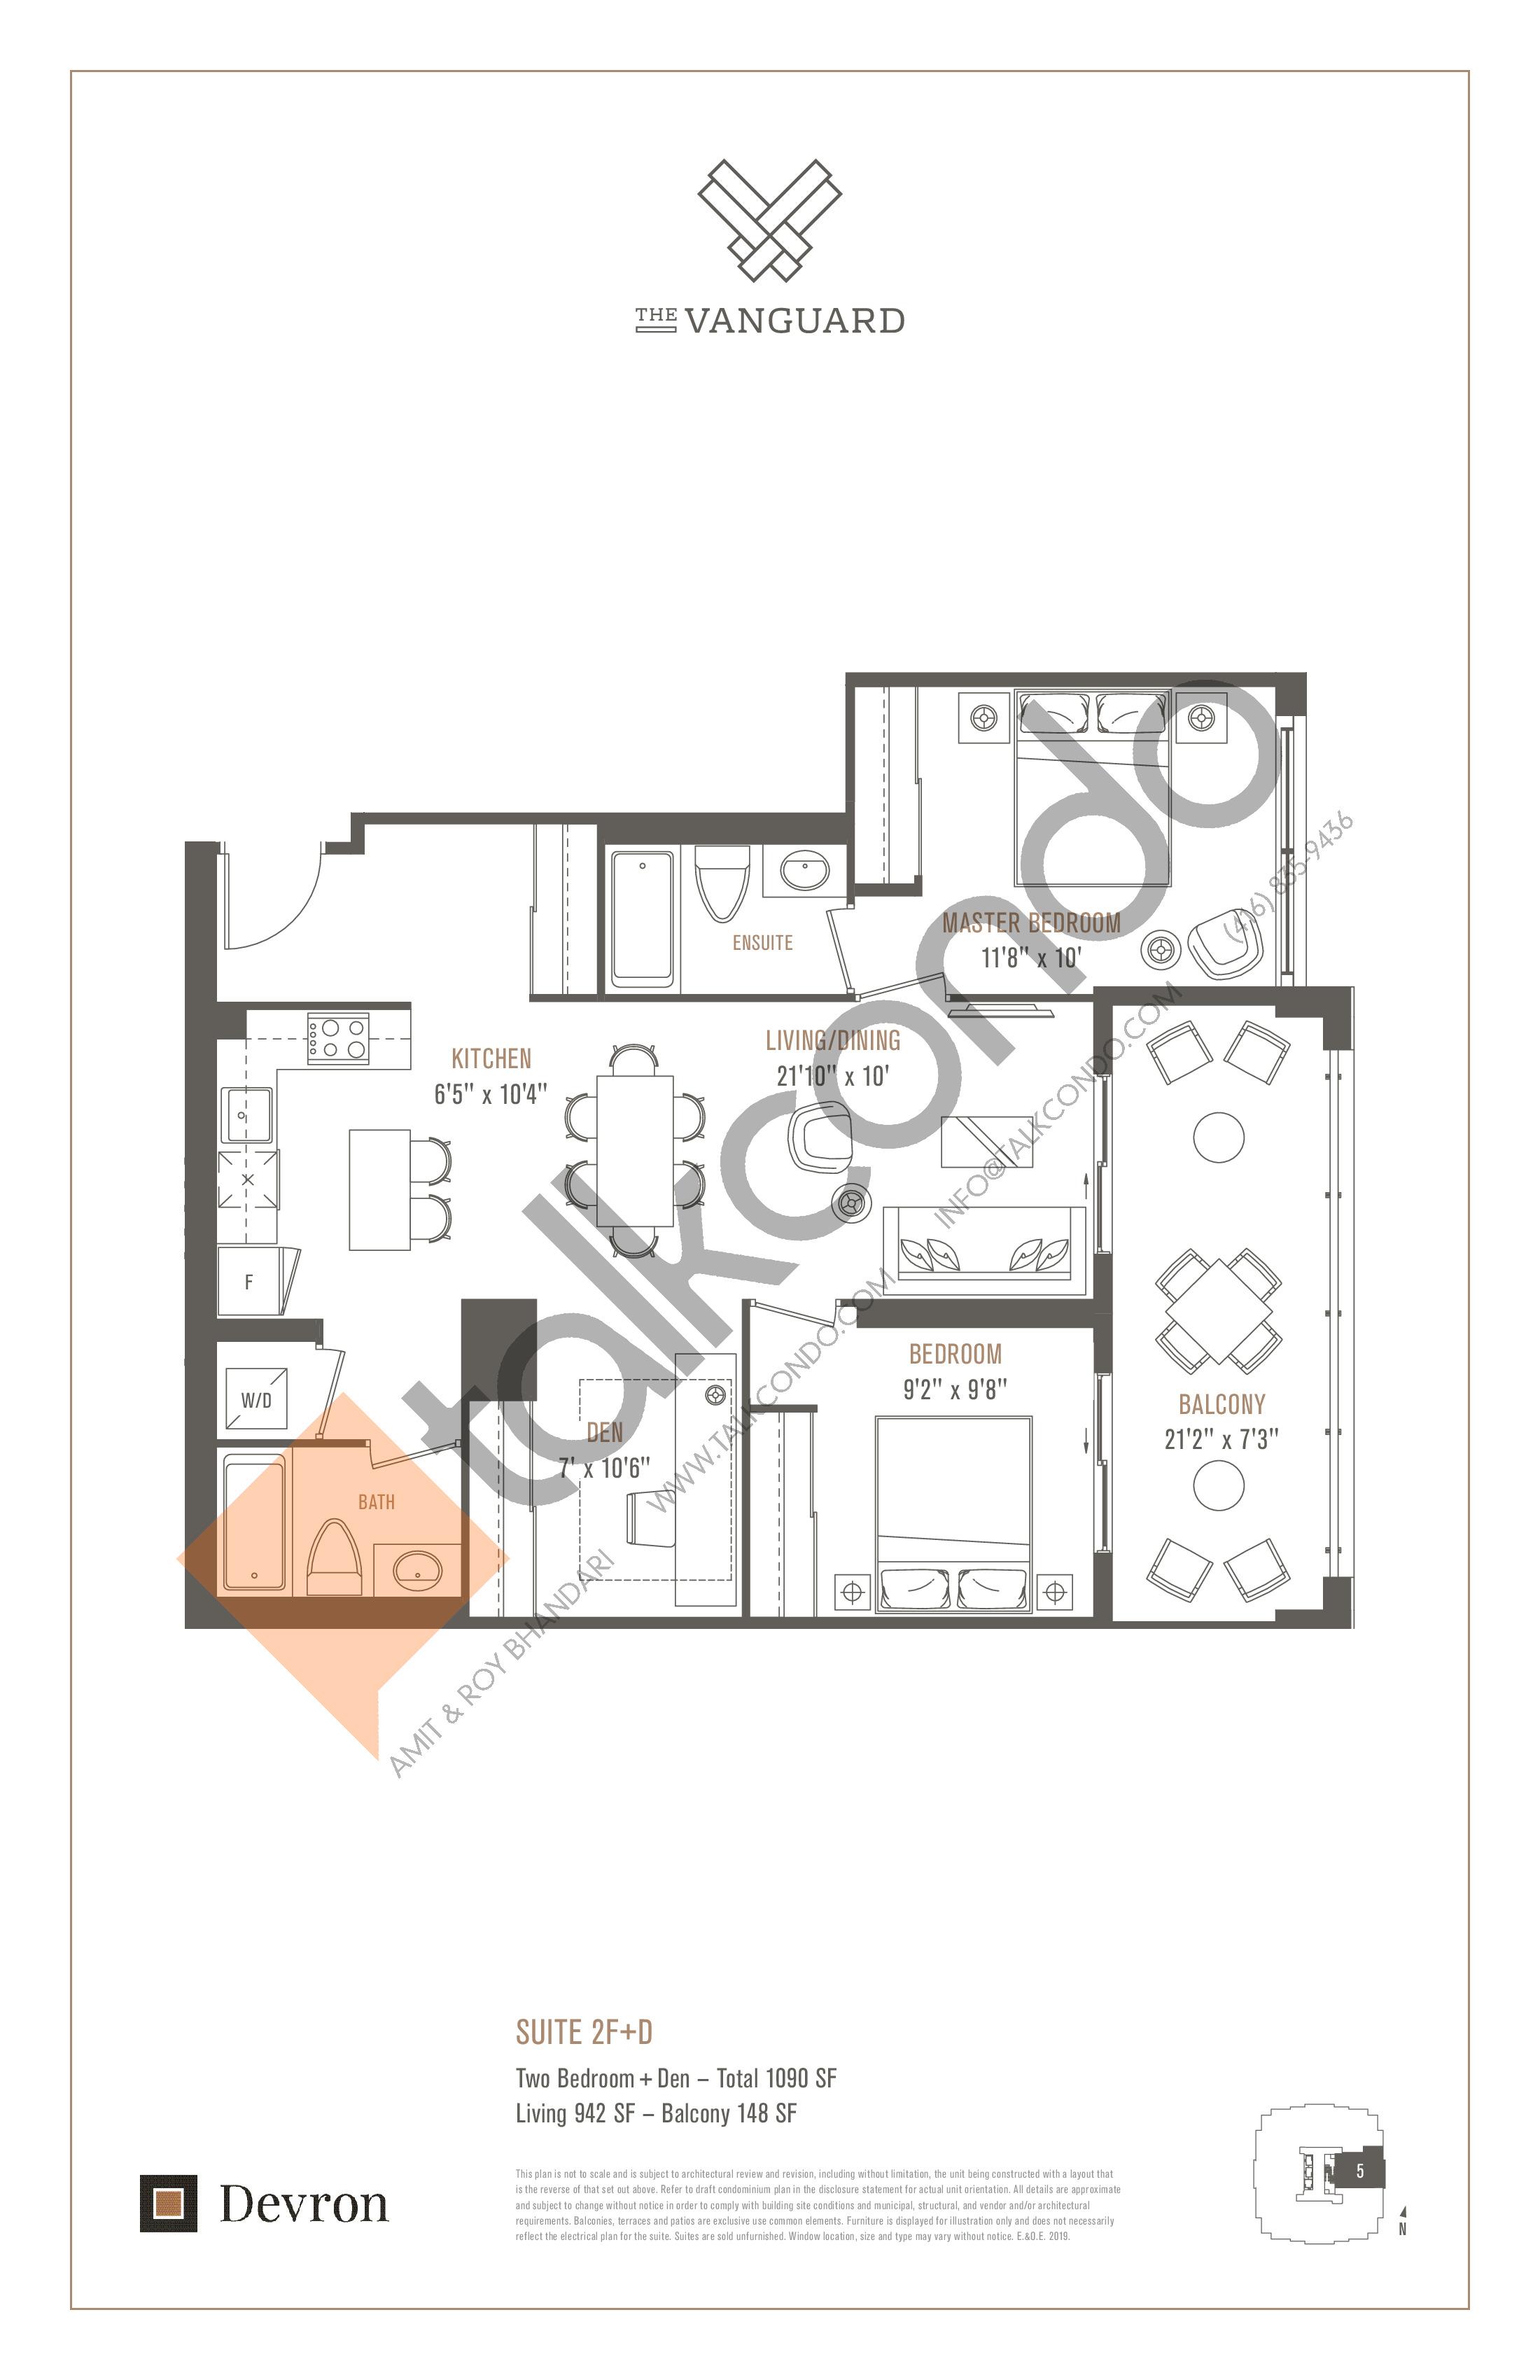 Suite 2F+D Floor Plan at The Vanguard - 942 sq.ft